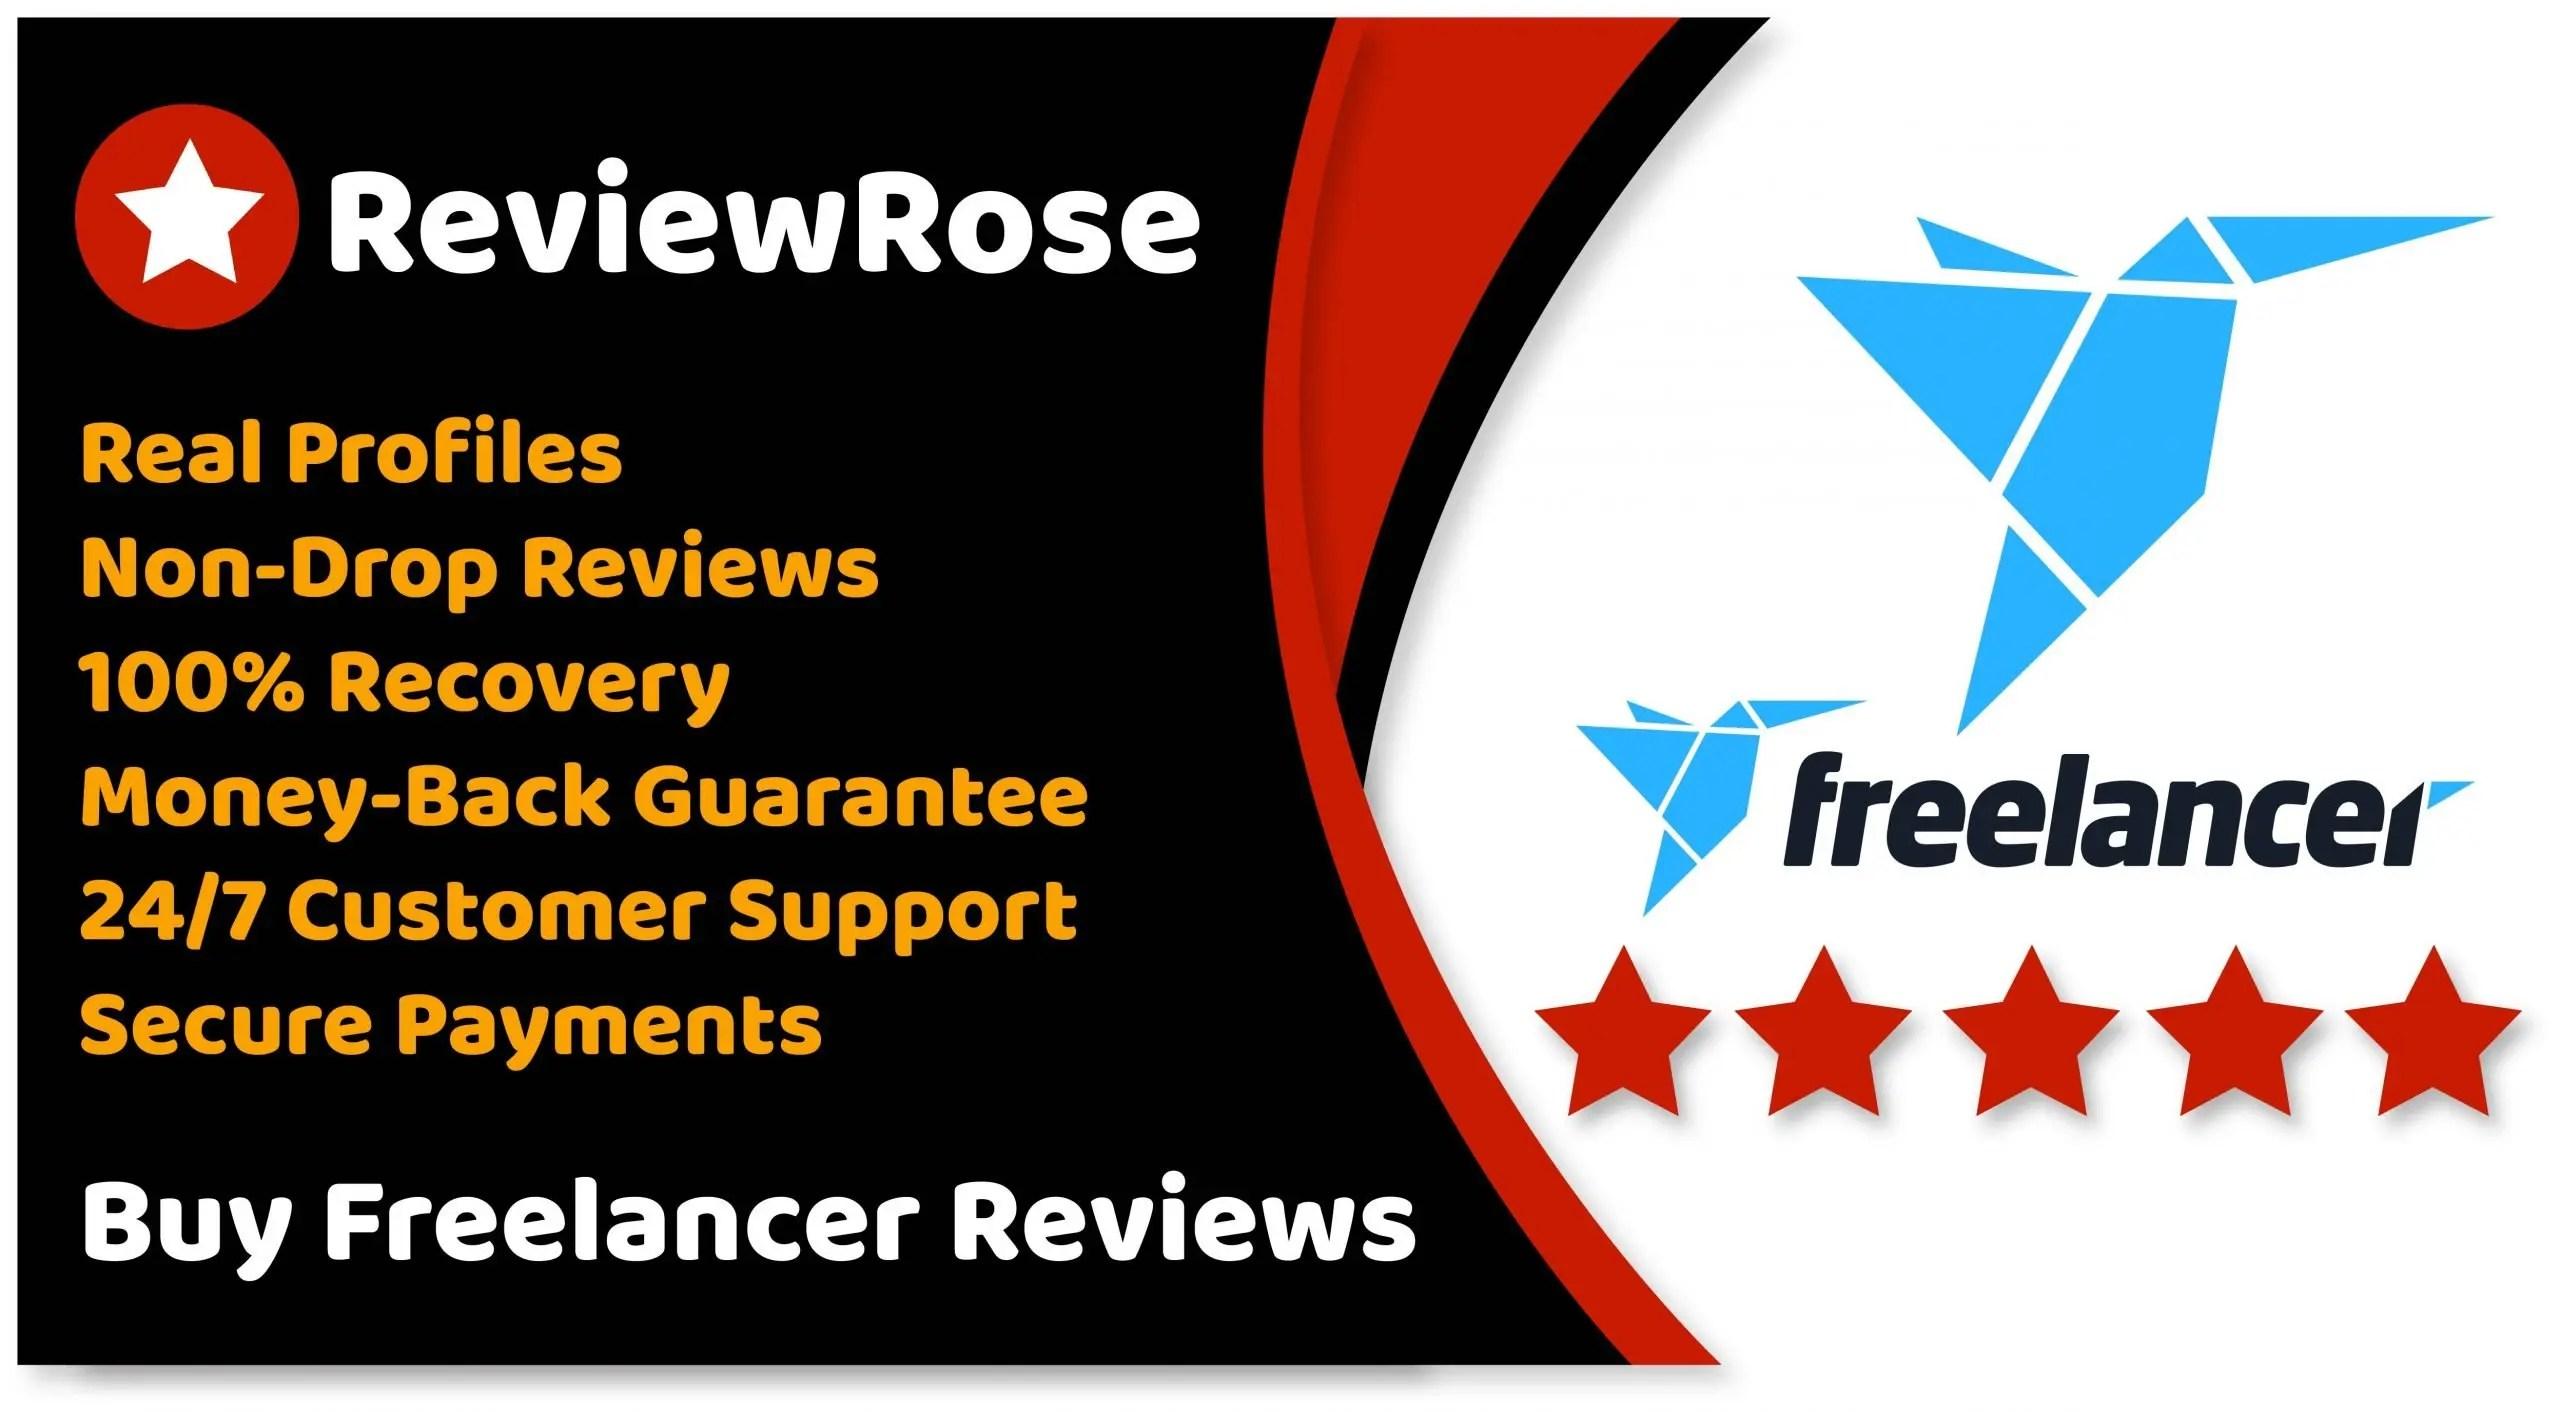 Buy Freelancer Reviews